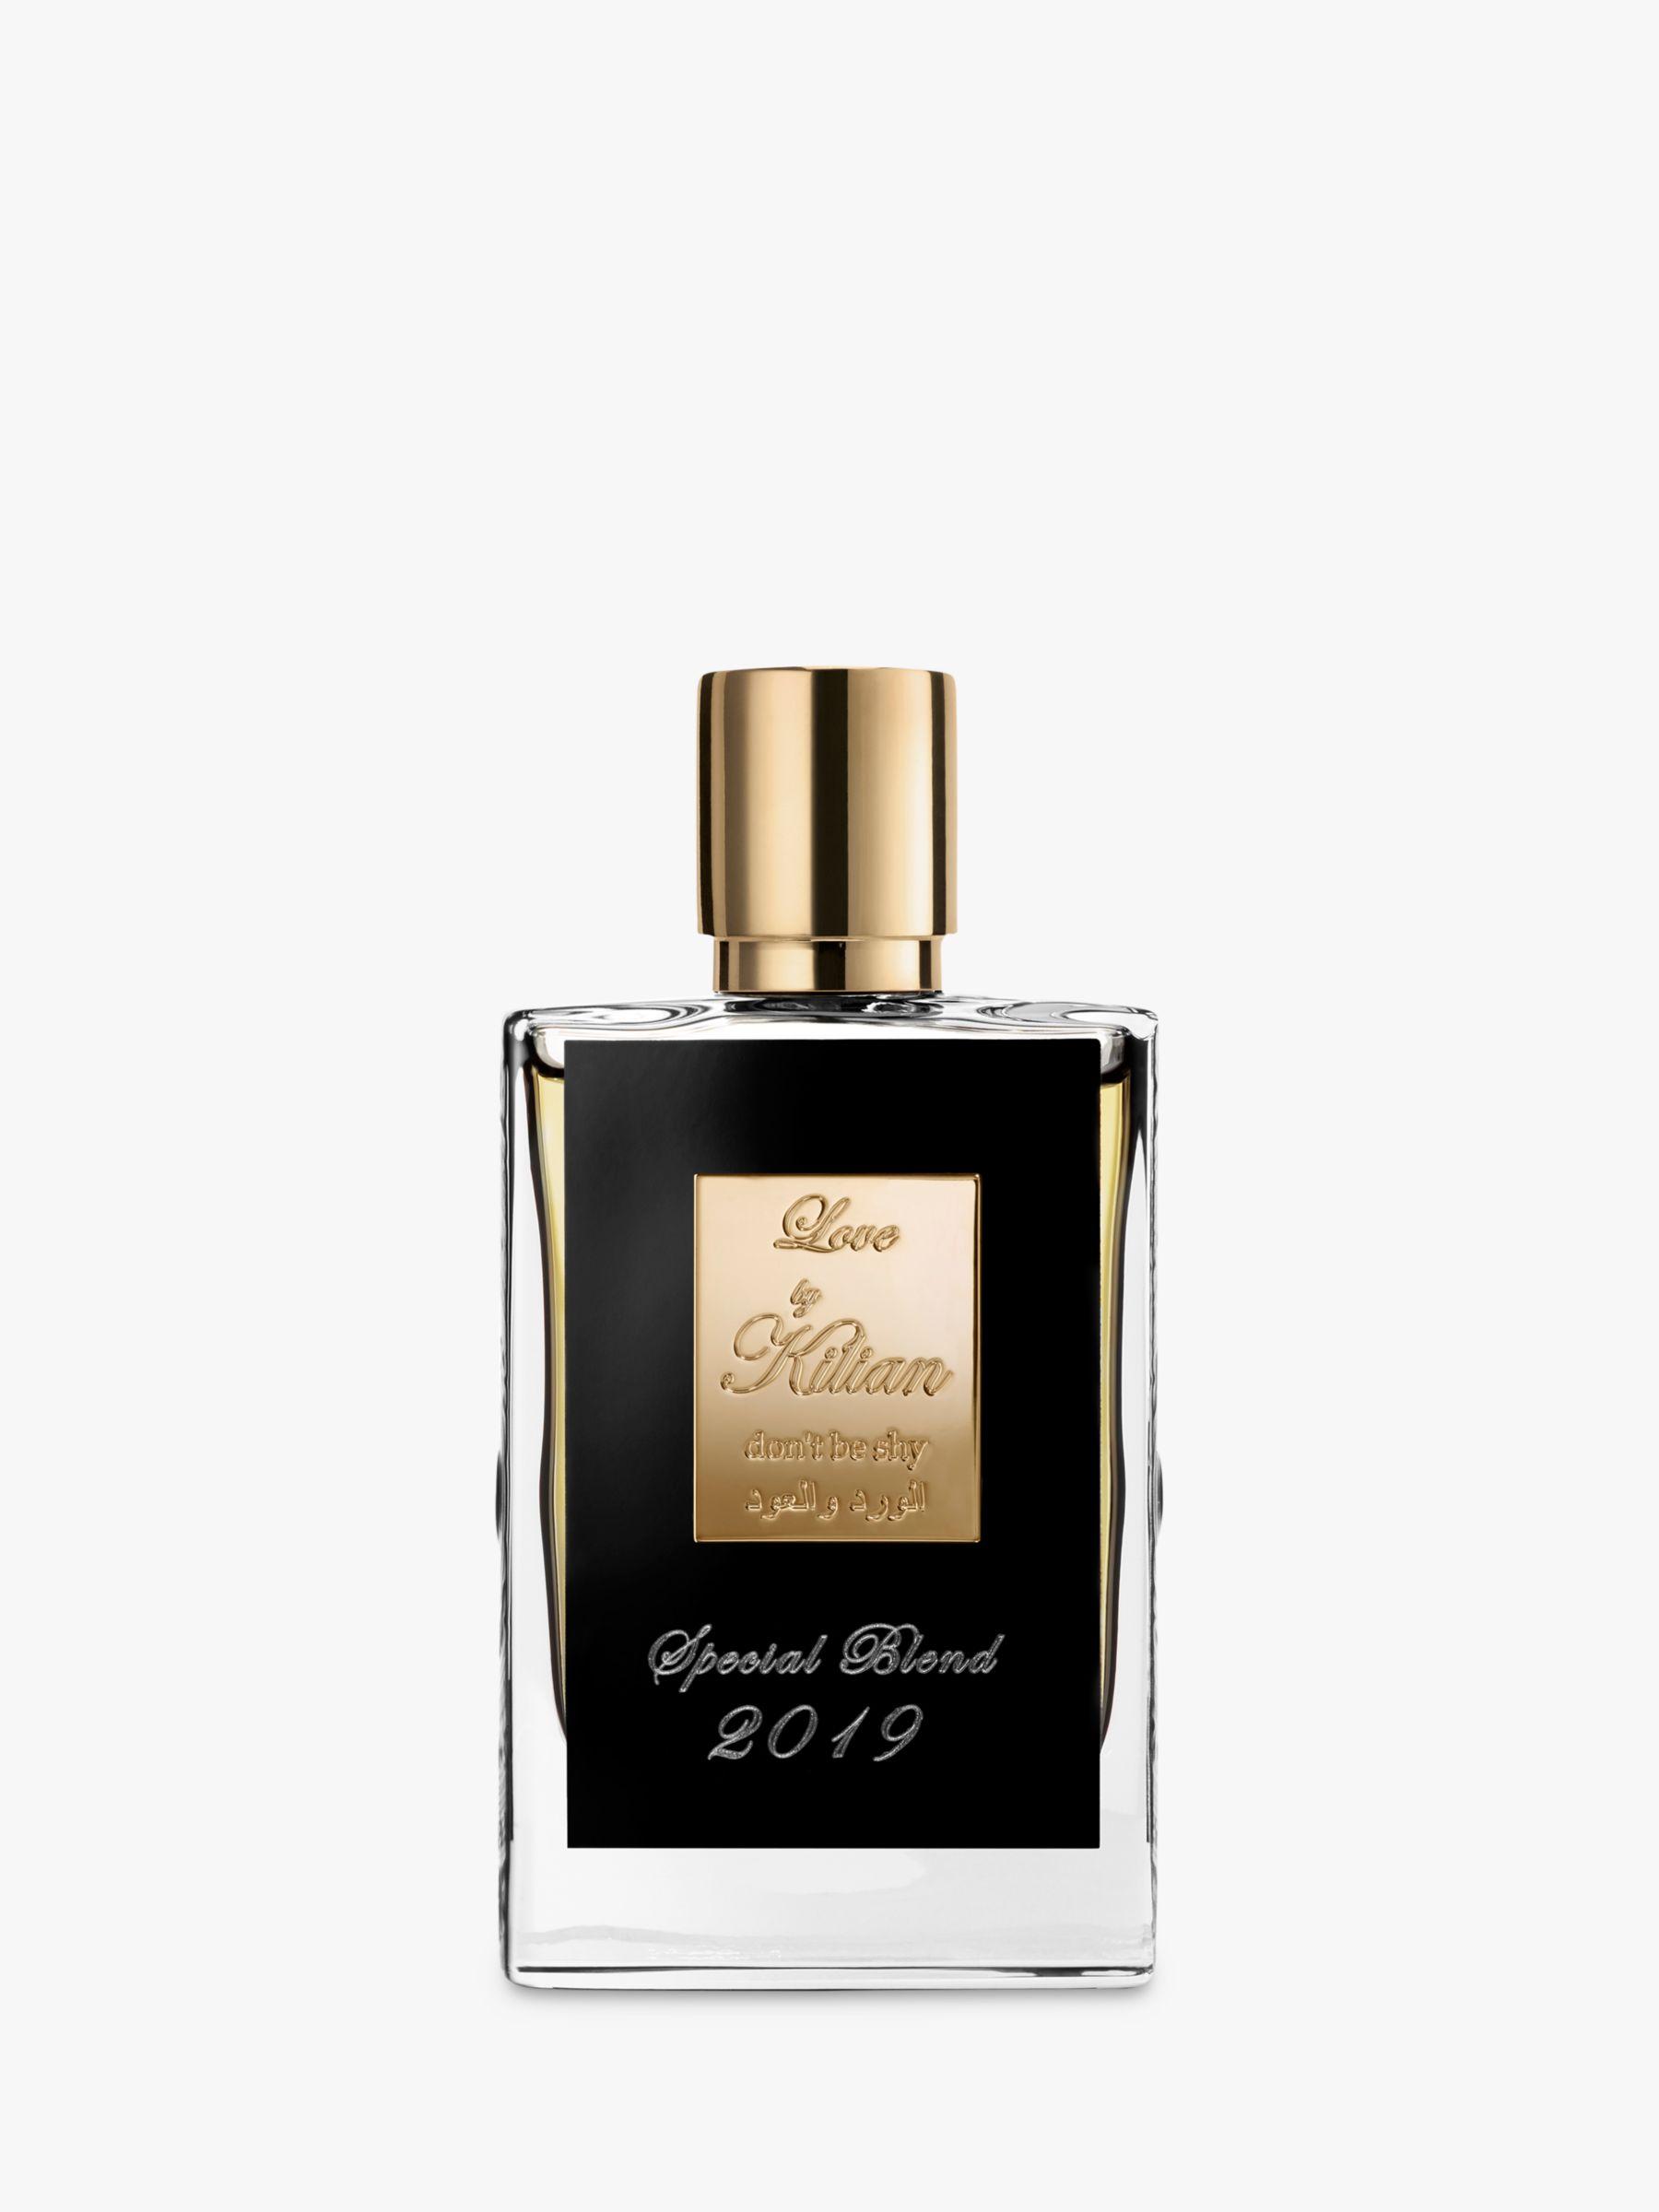 13d55eb2e Kilian Love, Don't Be Shy Rose & Oud Eau de Parfum Limited Edition  Refillable Spray, 50ml at John Lewis & Partners